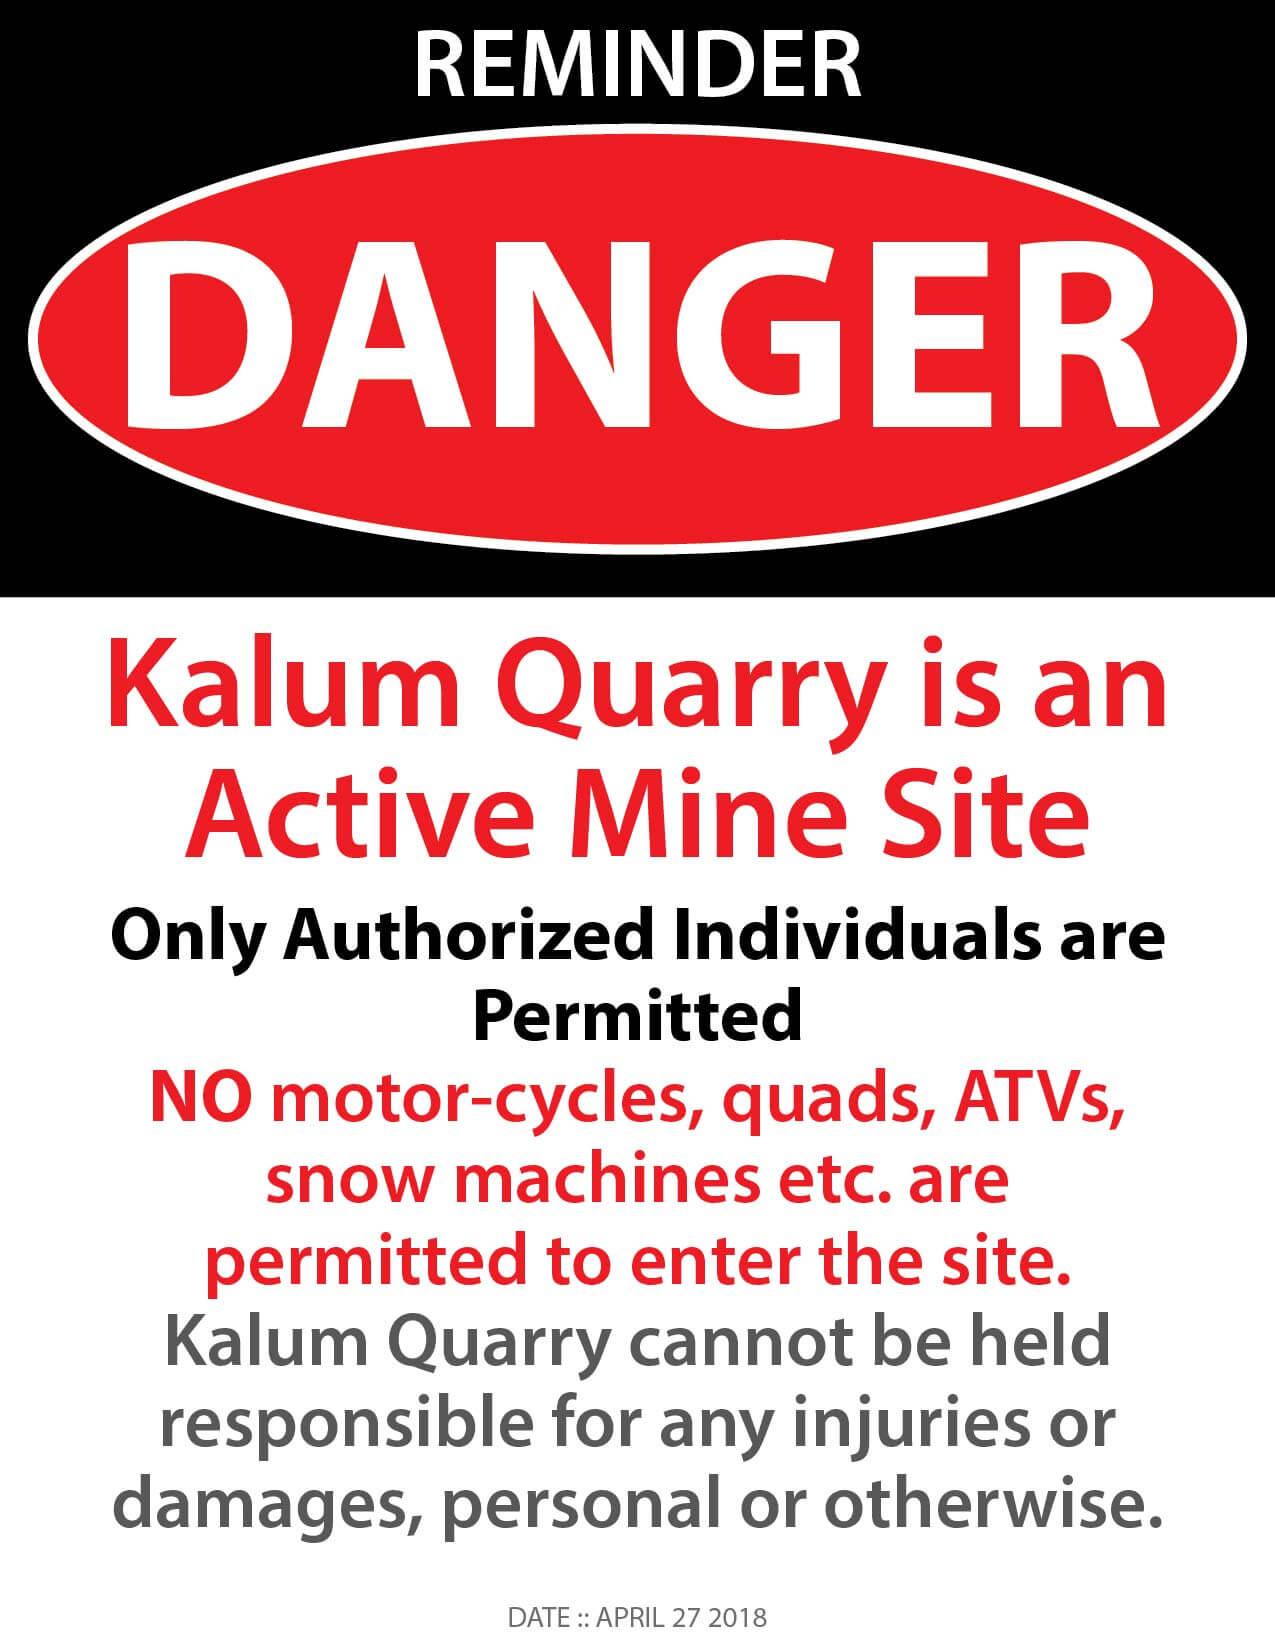 Reminder: Kalum Quarry is an Active Mine Site